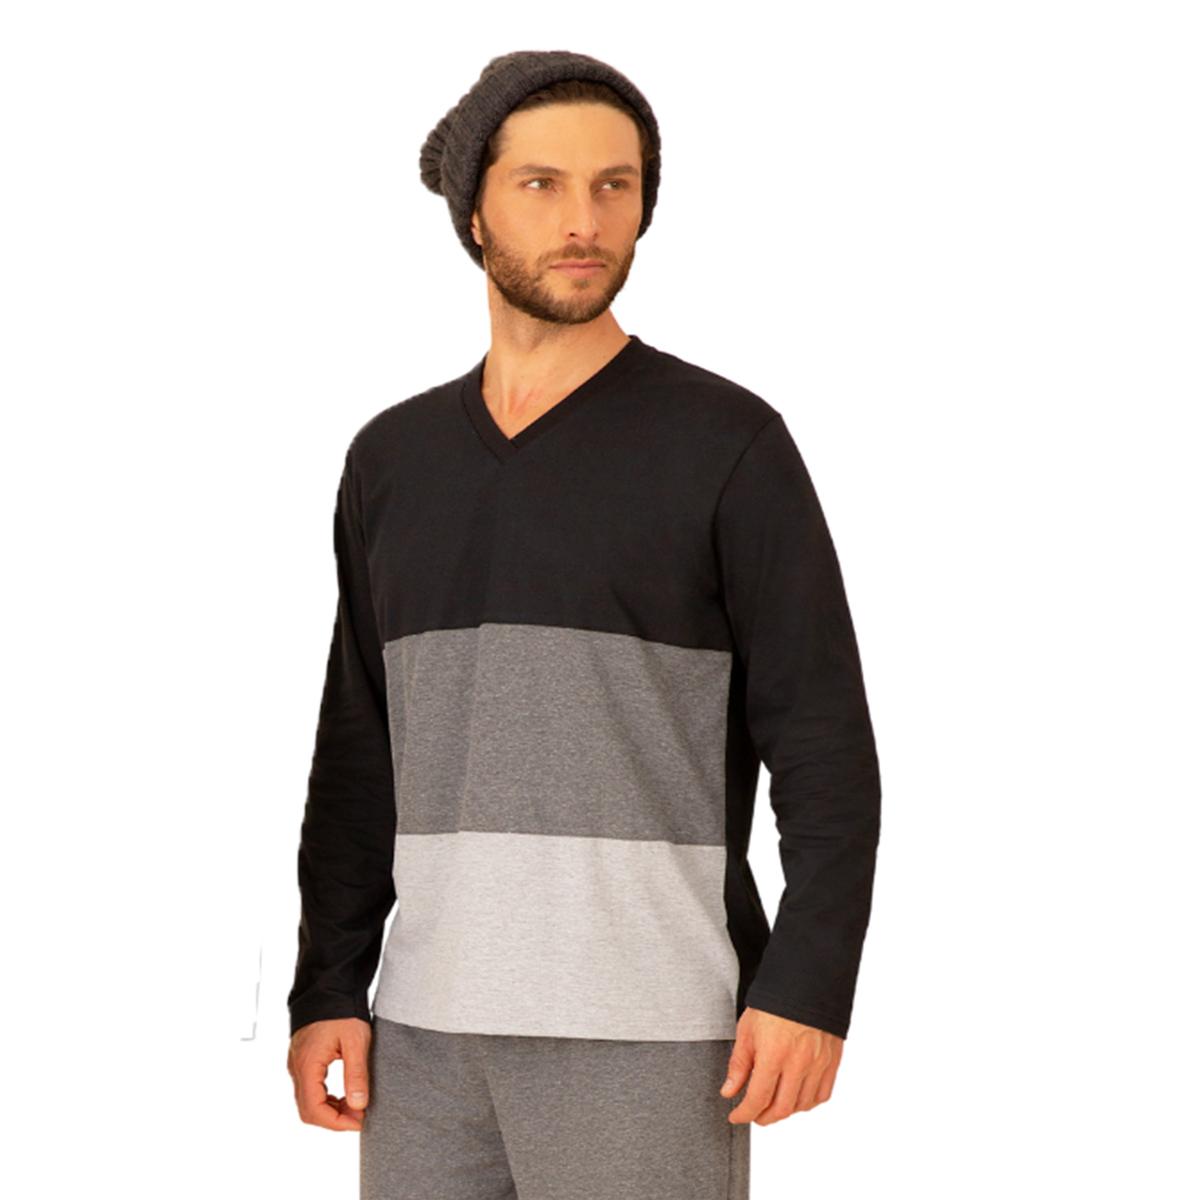 Pijama masculino adulto viscose decote v listra